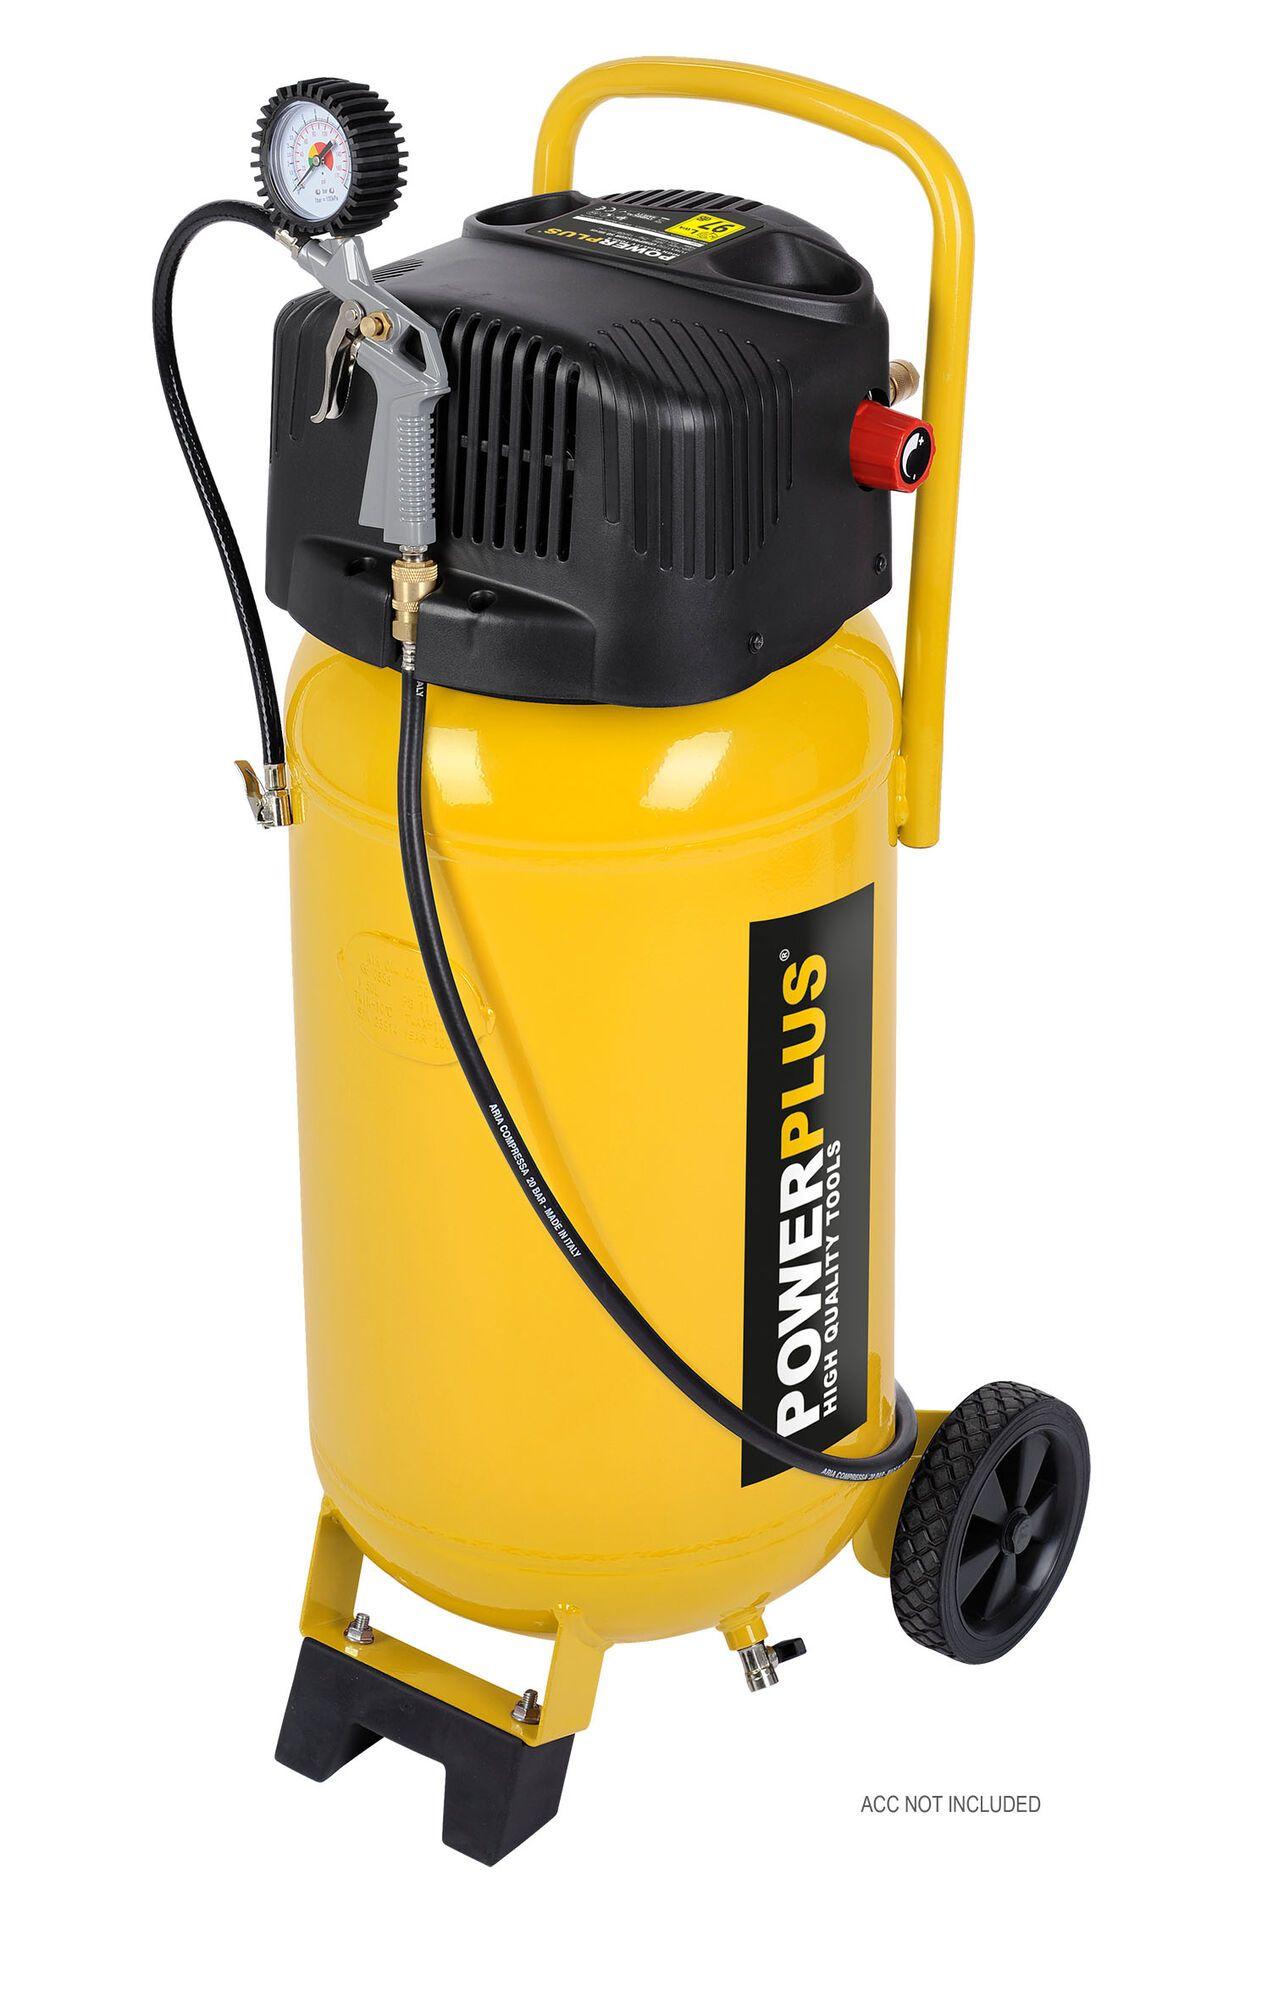 Powerplus POWX1750 Mobiele 1500W olievrije compressor met 50 liter tank